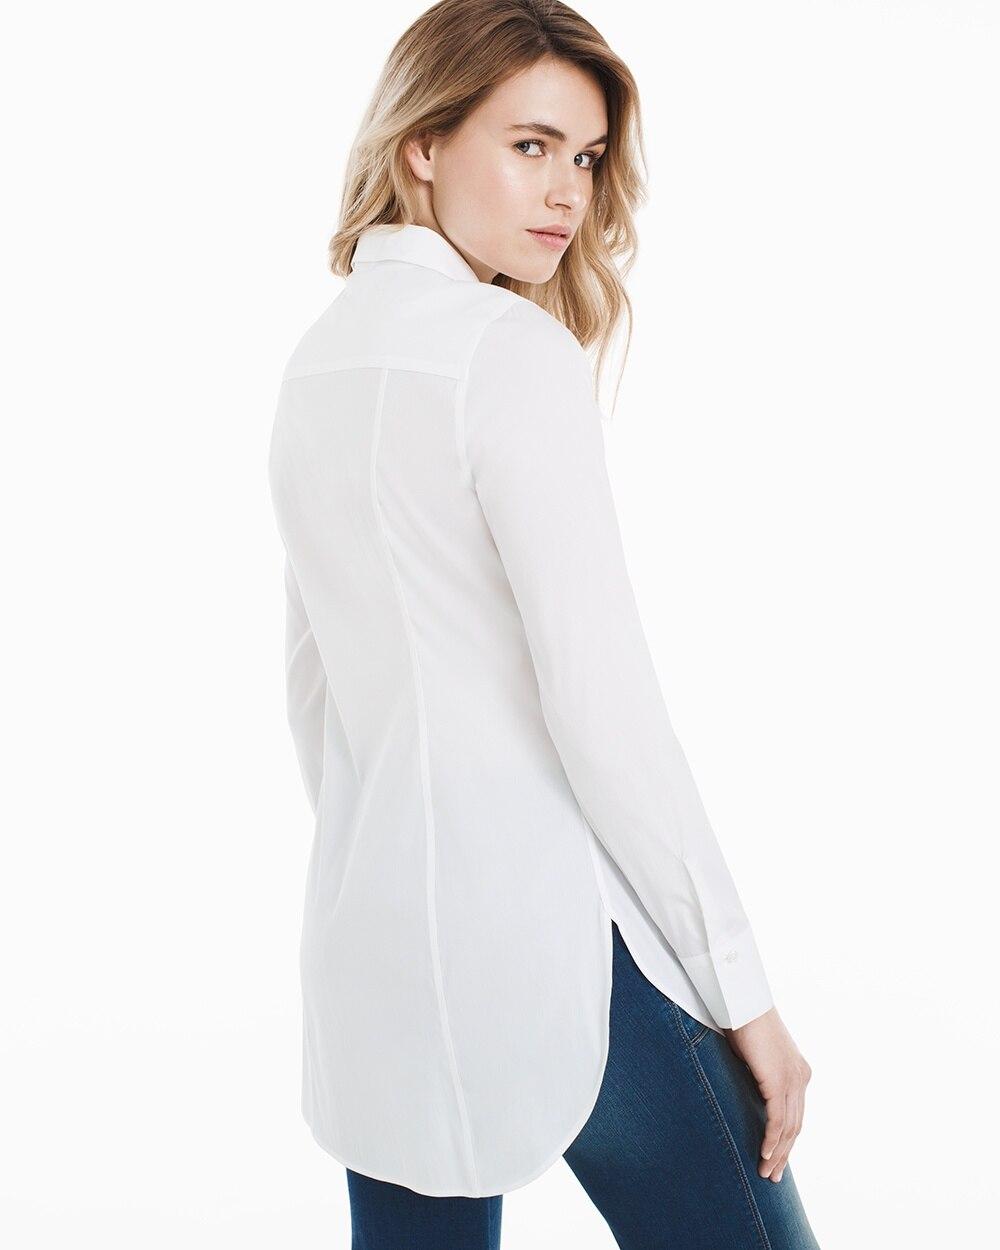 Wrinkle Free Long White Poplin Shirt Whbm